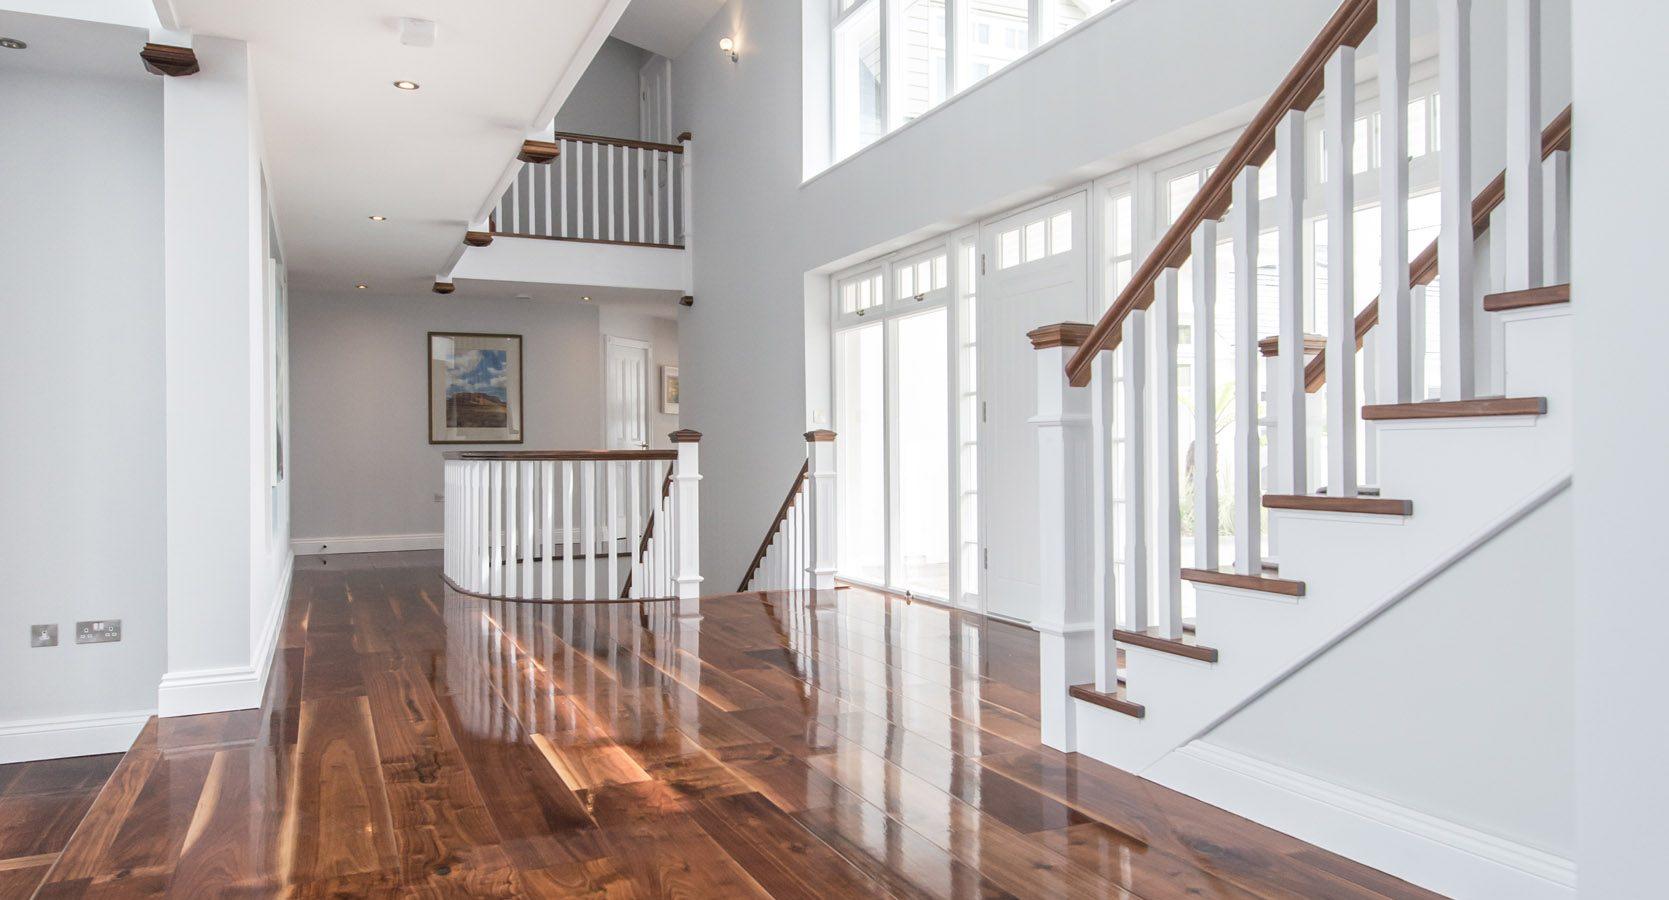 Glossy wood floor in light hall